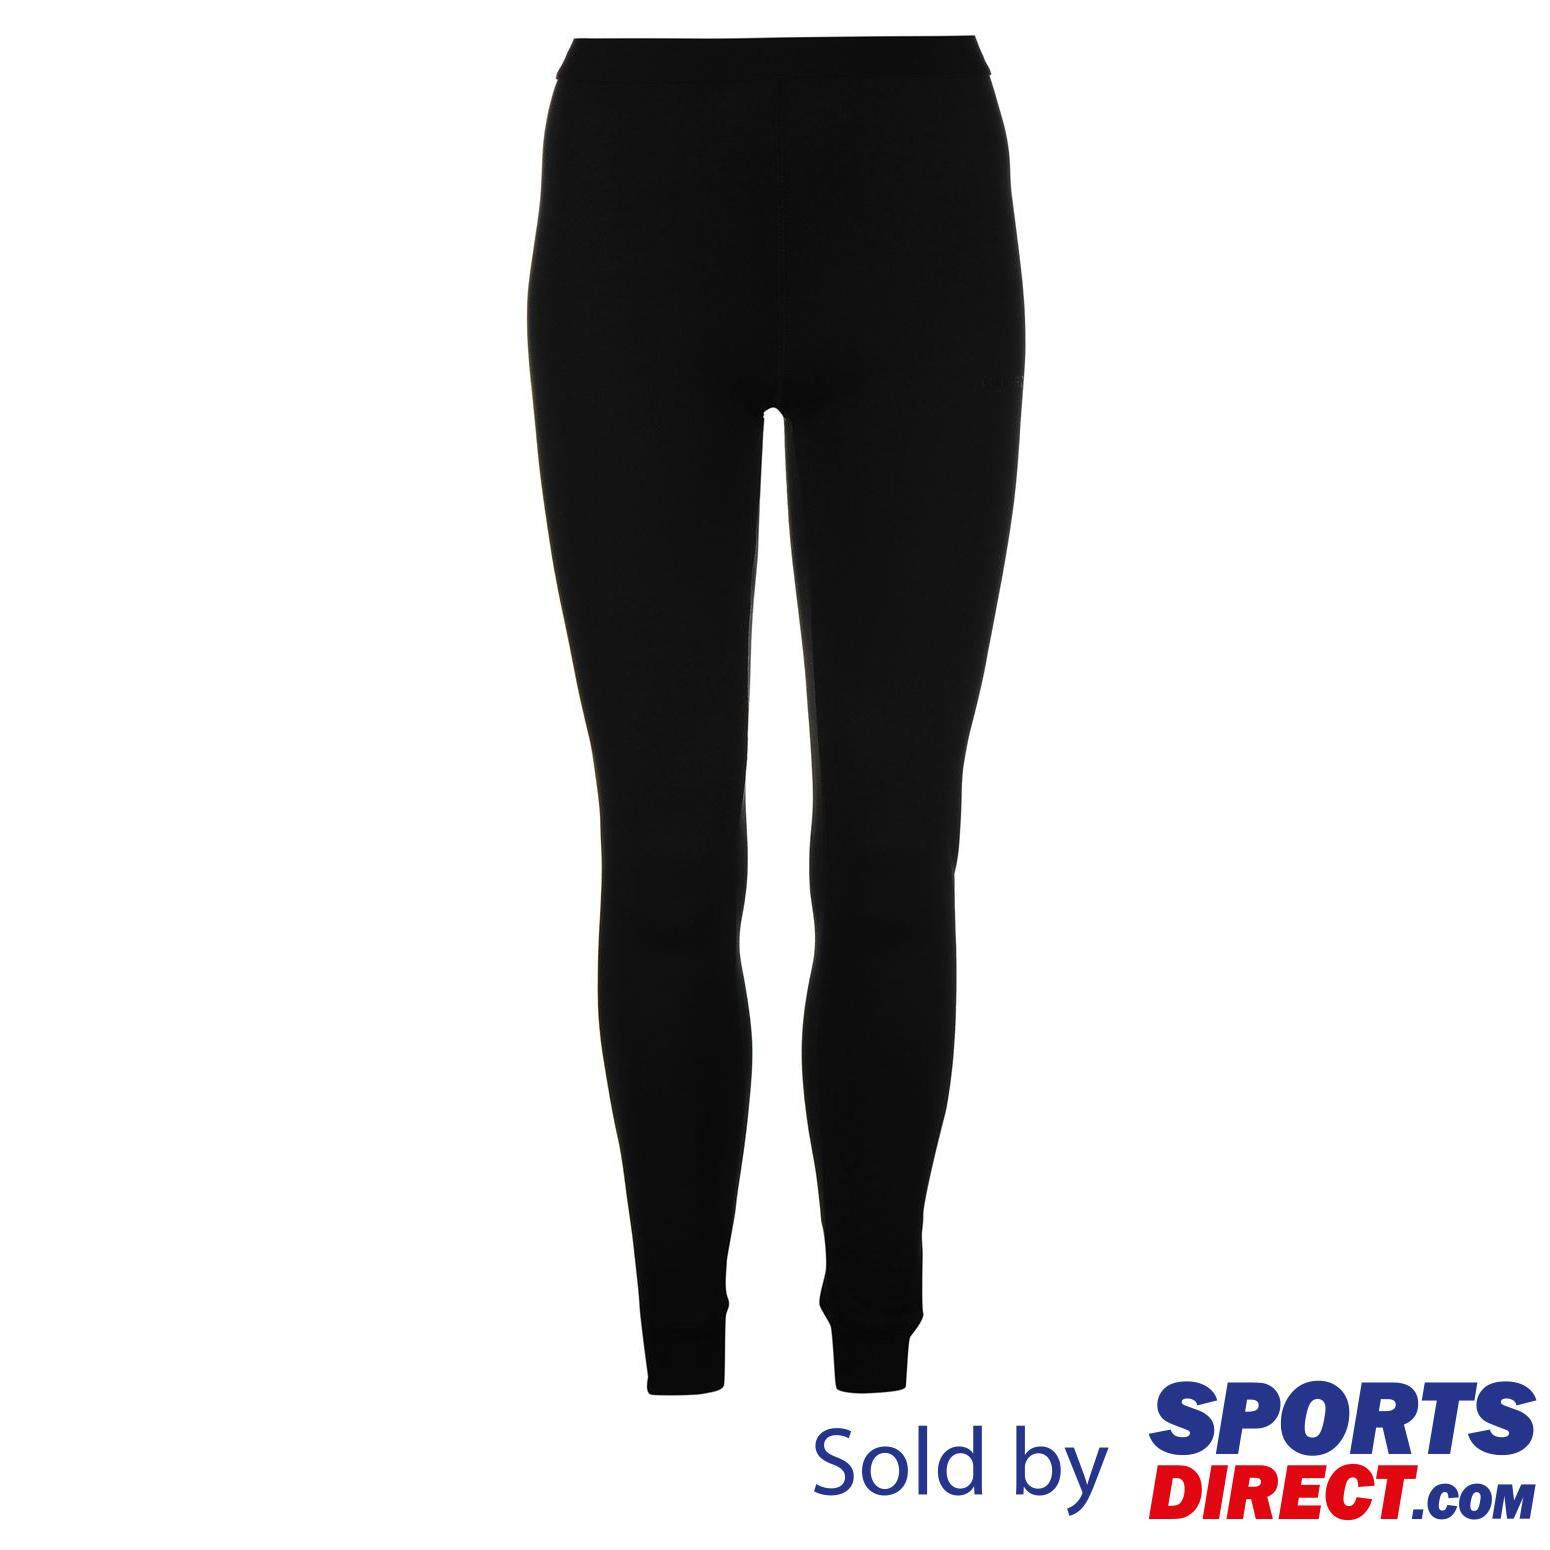 Campri Baselayer Pants Ladies (black) By Sports Direct Mst Sdn Bhd.